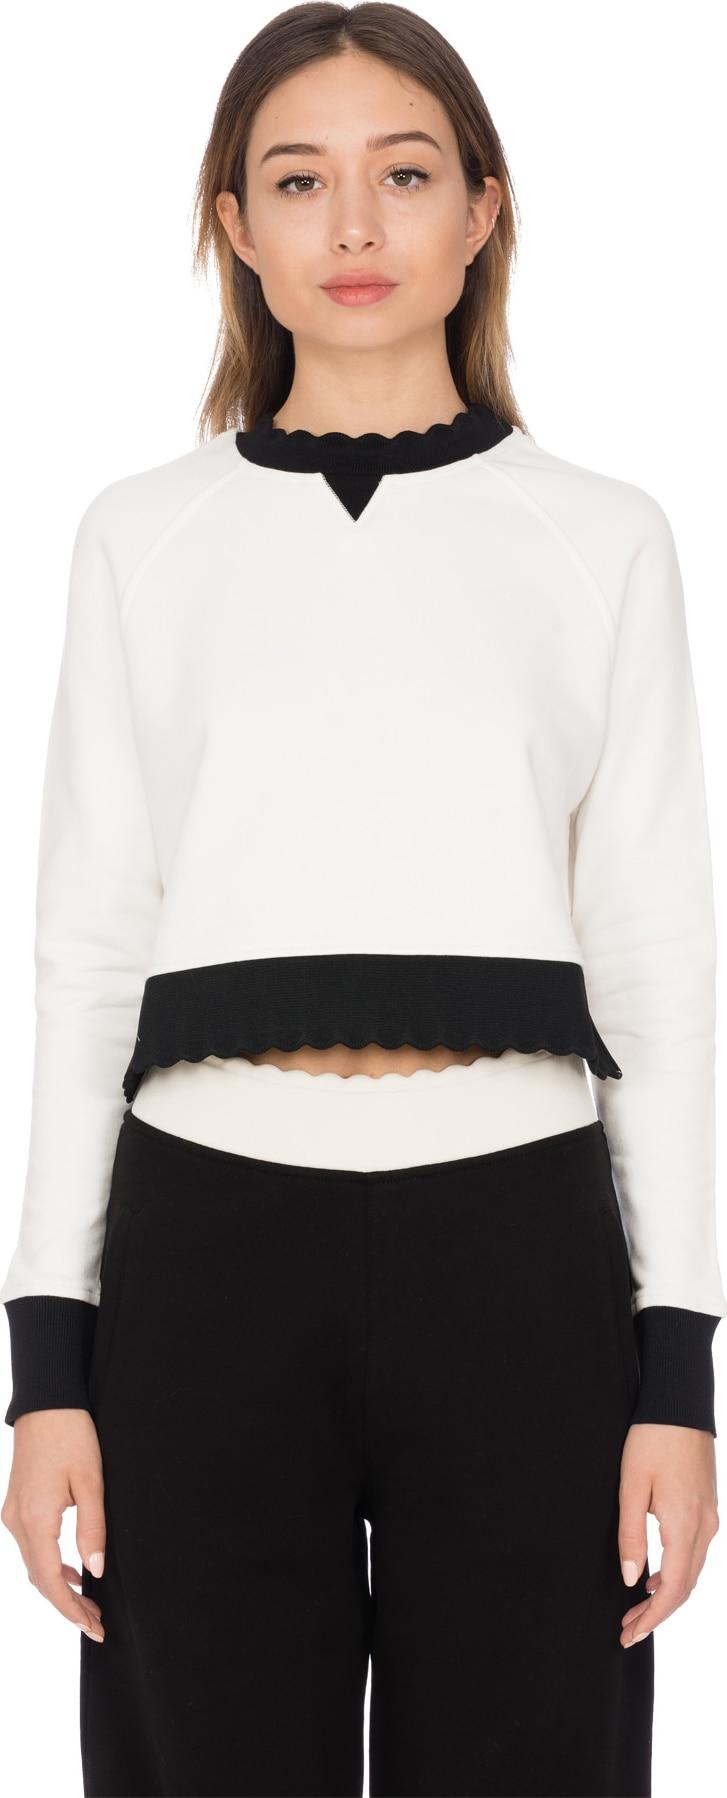 McQ Alexander McQueen  Scalloped Crop Pullover - White Black ... 9d3b346fe16